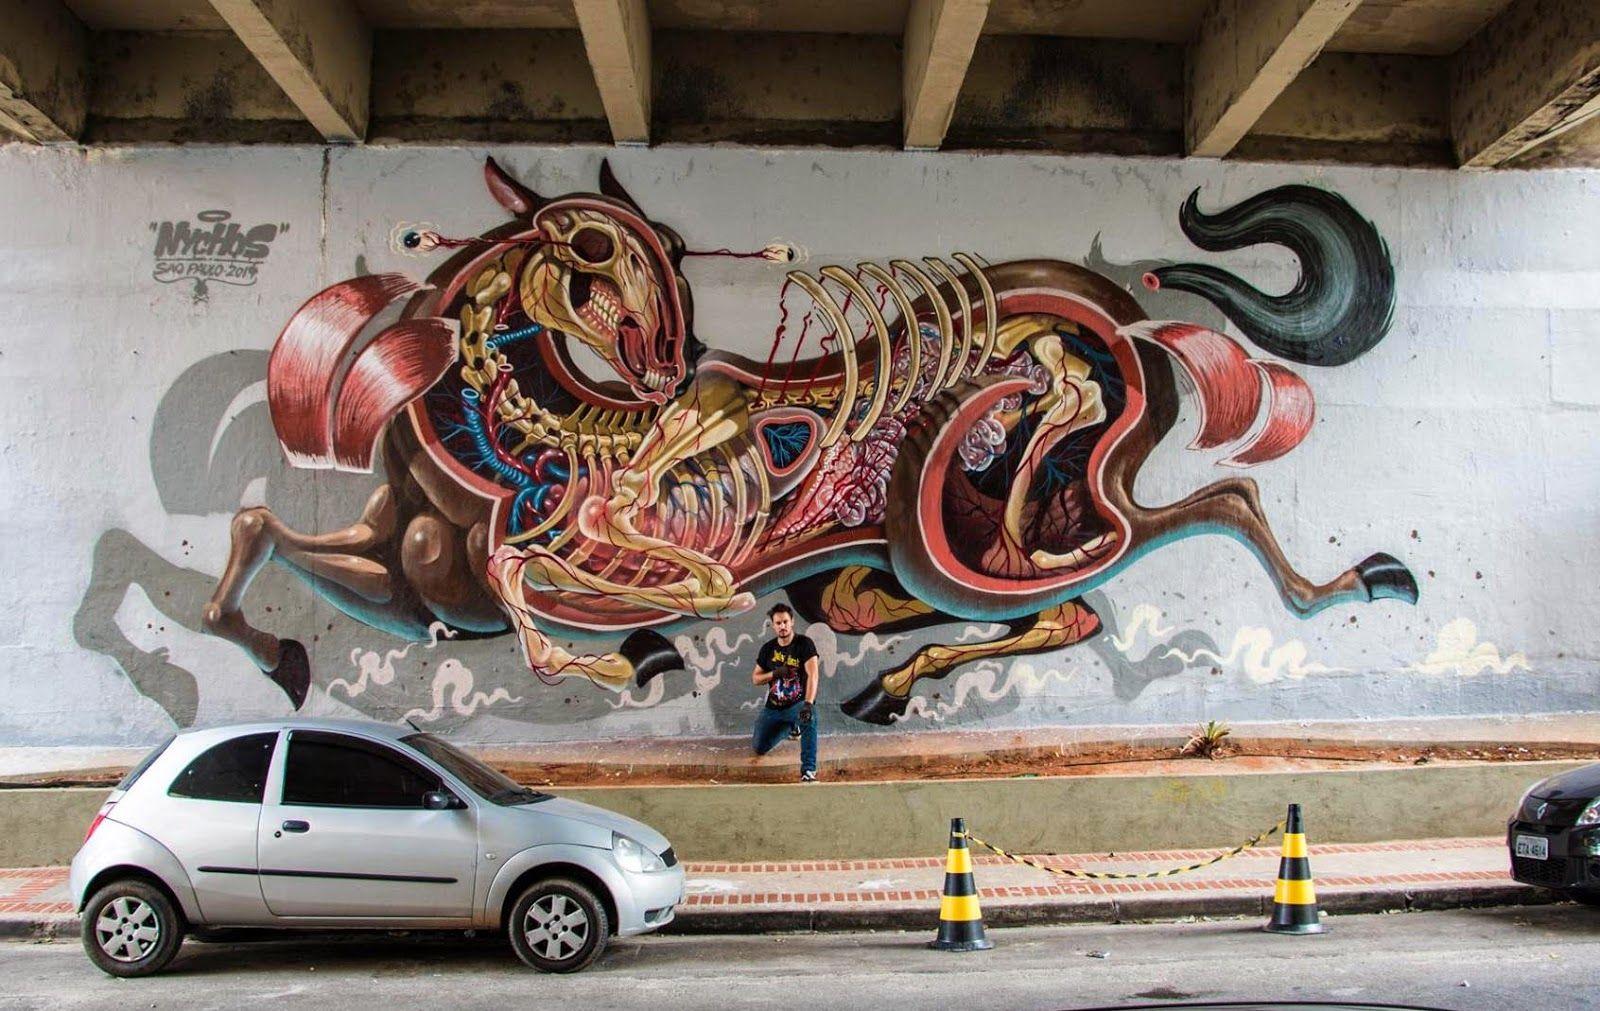 Nychos New Mural - Sao Paulo, Brazil